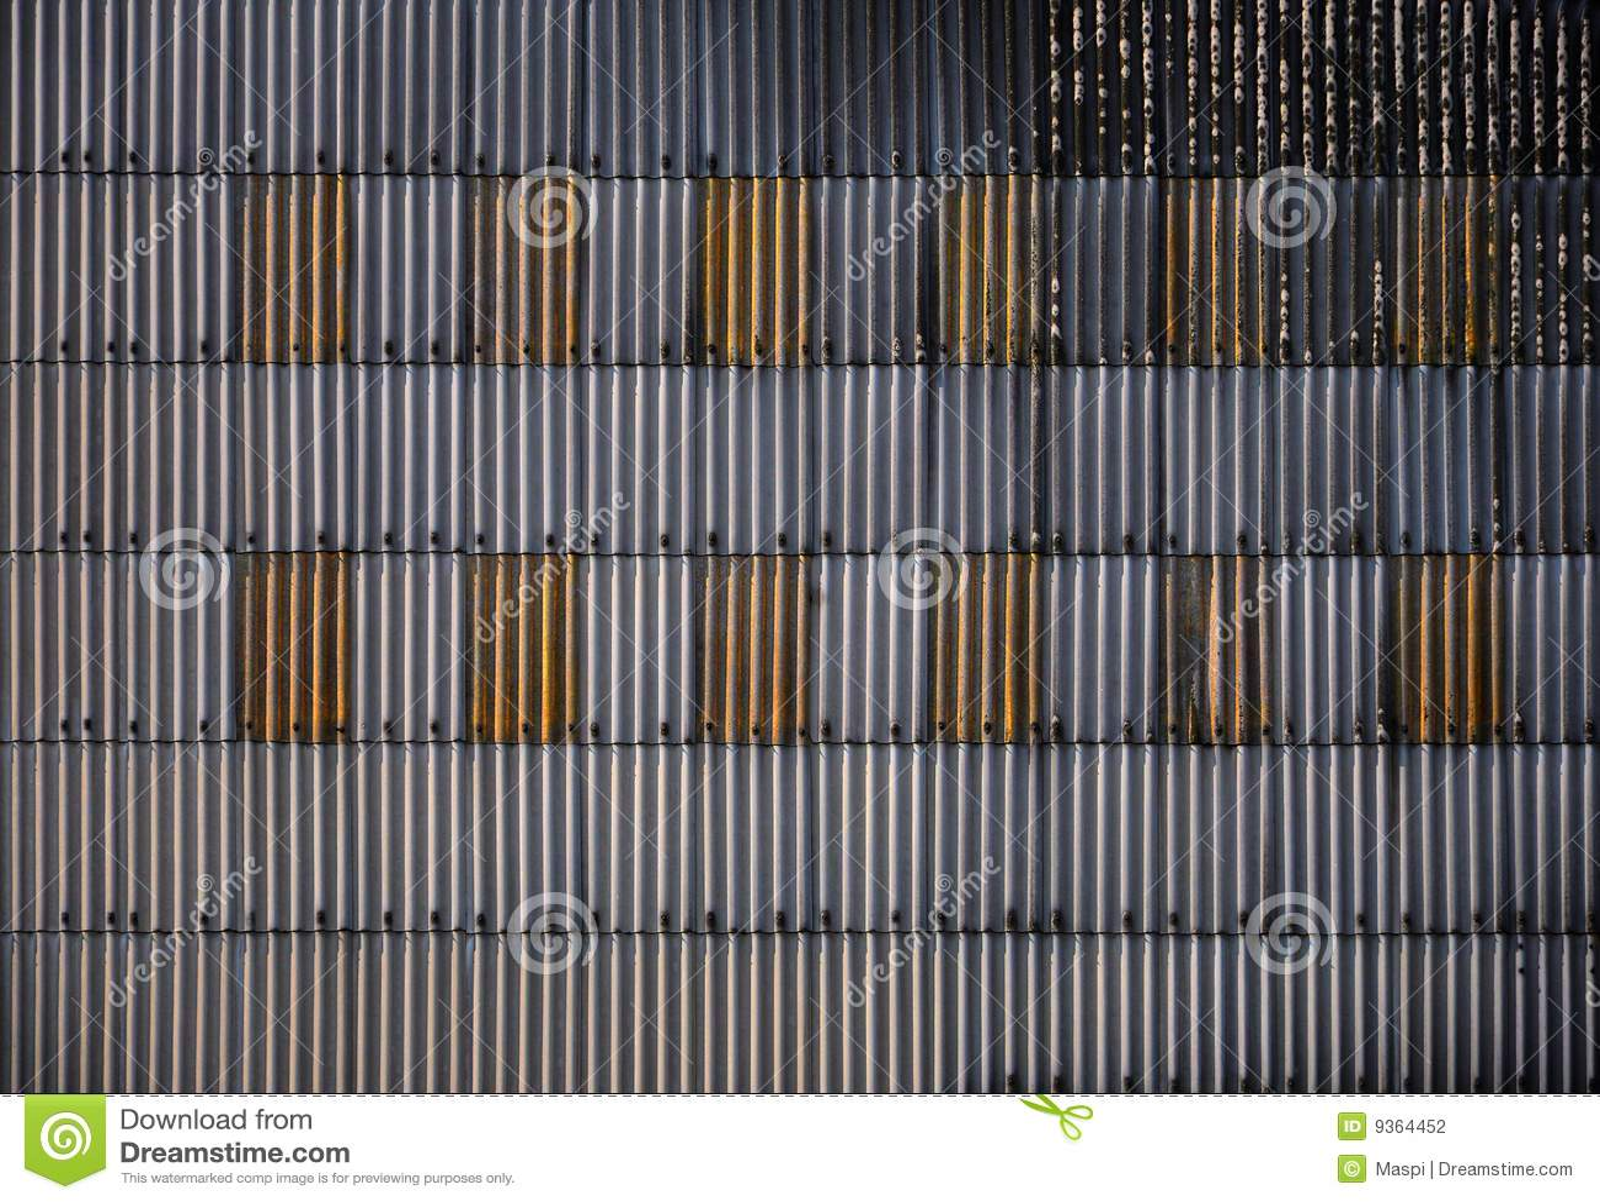 Corrugated Iron Wall Stock Photography Image 9364452